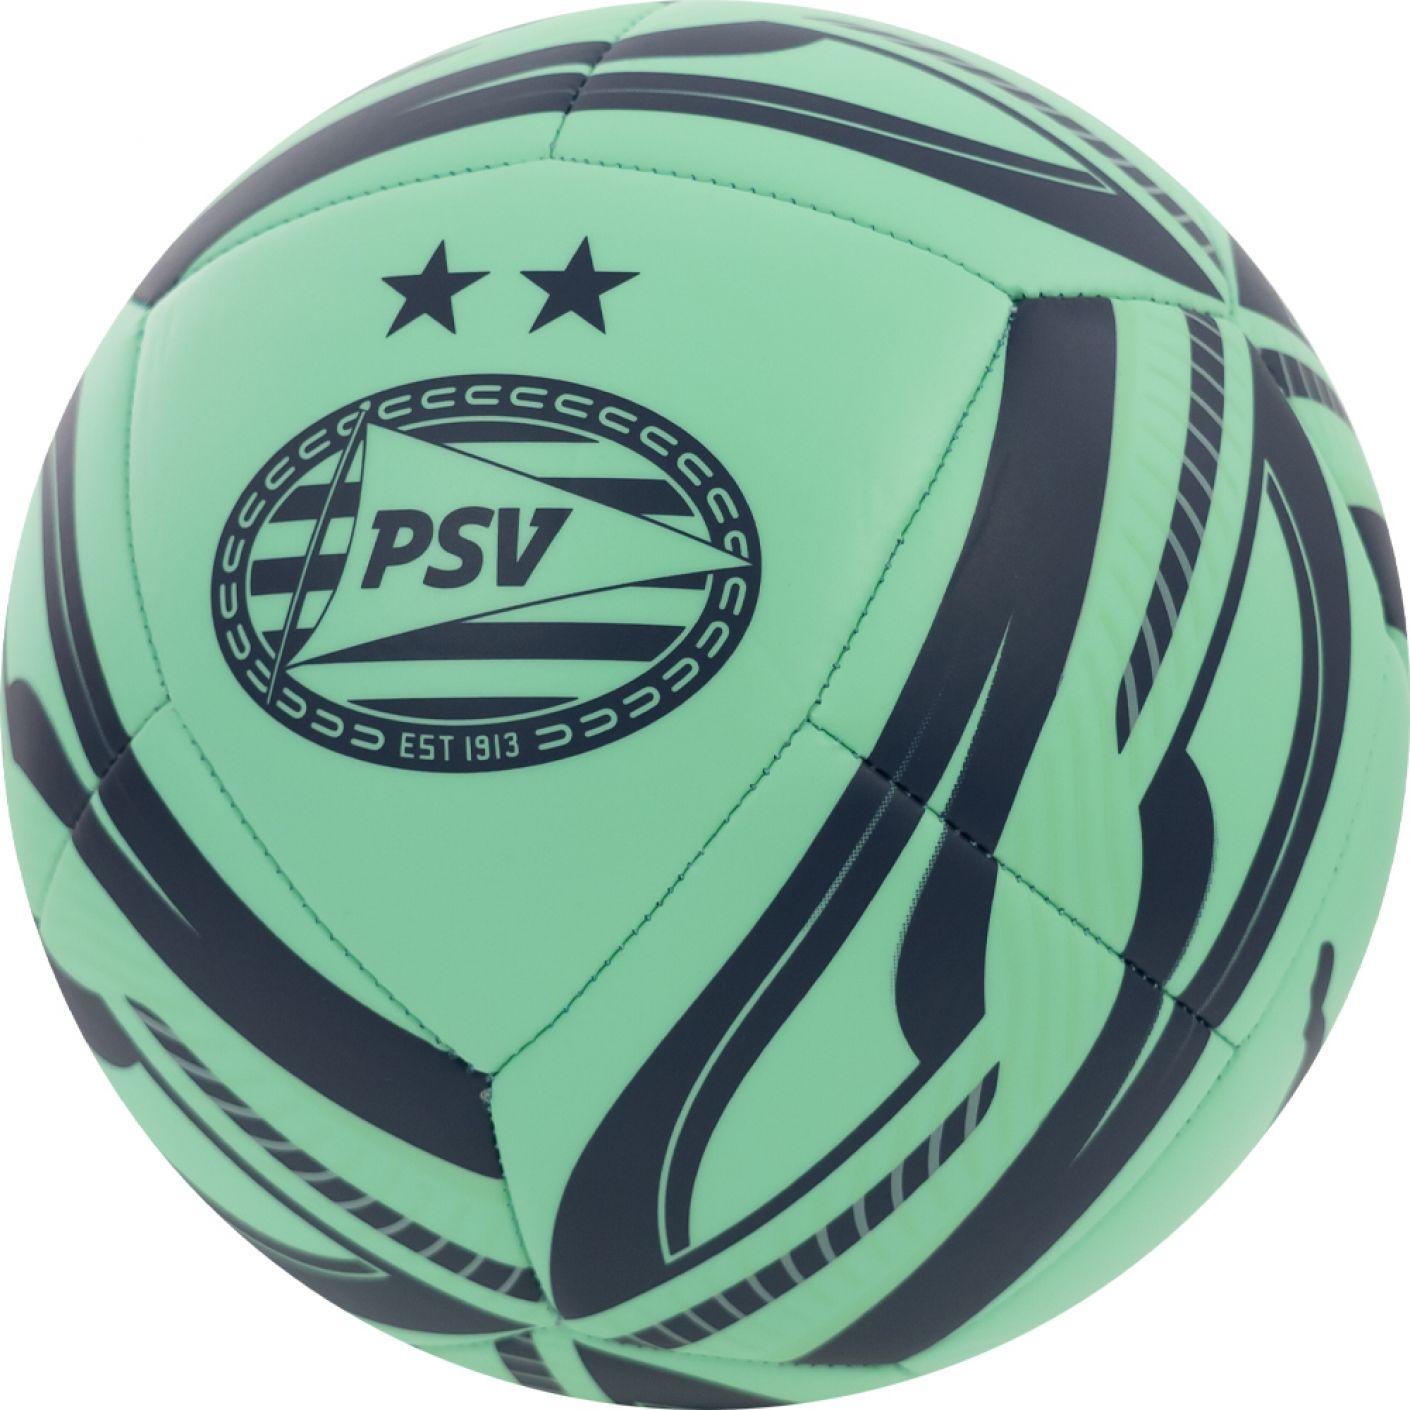 PSV PUMA Bal Groen 21/22